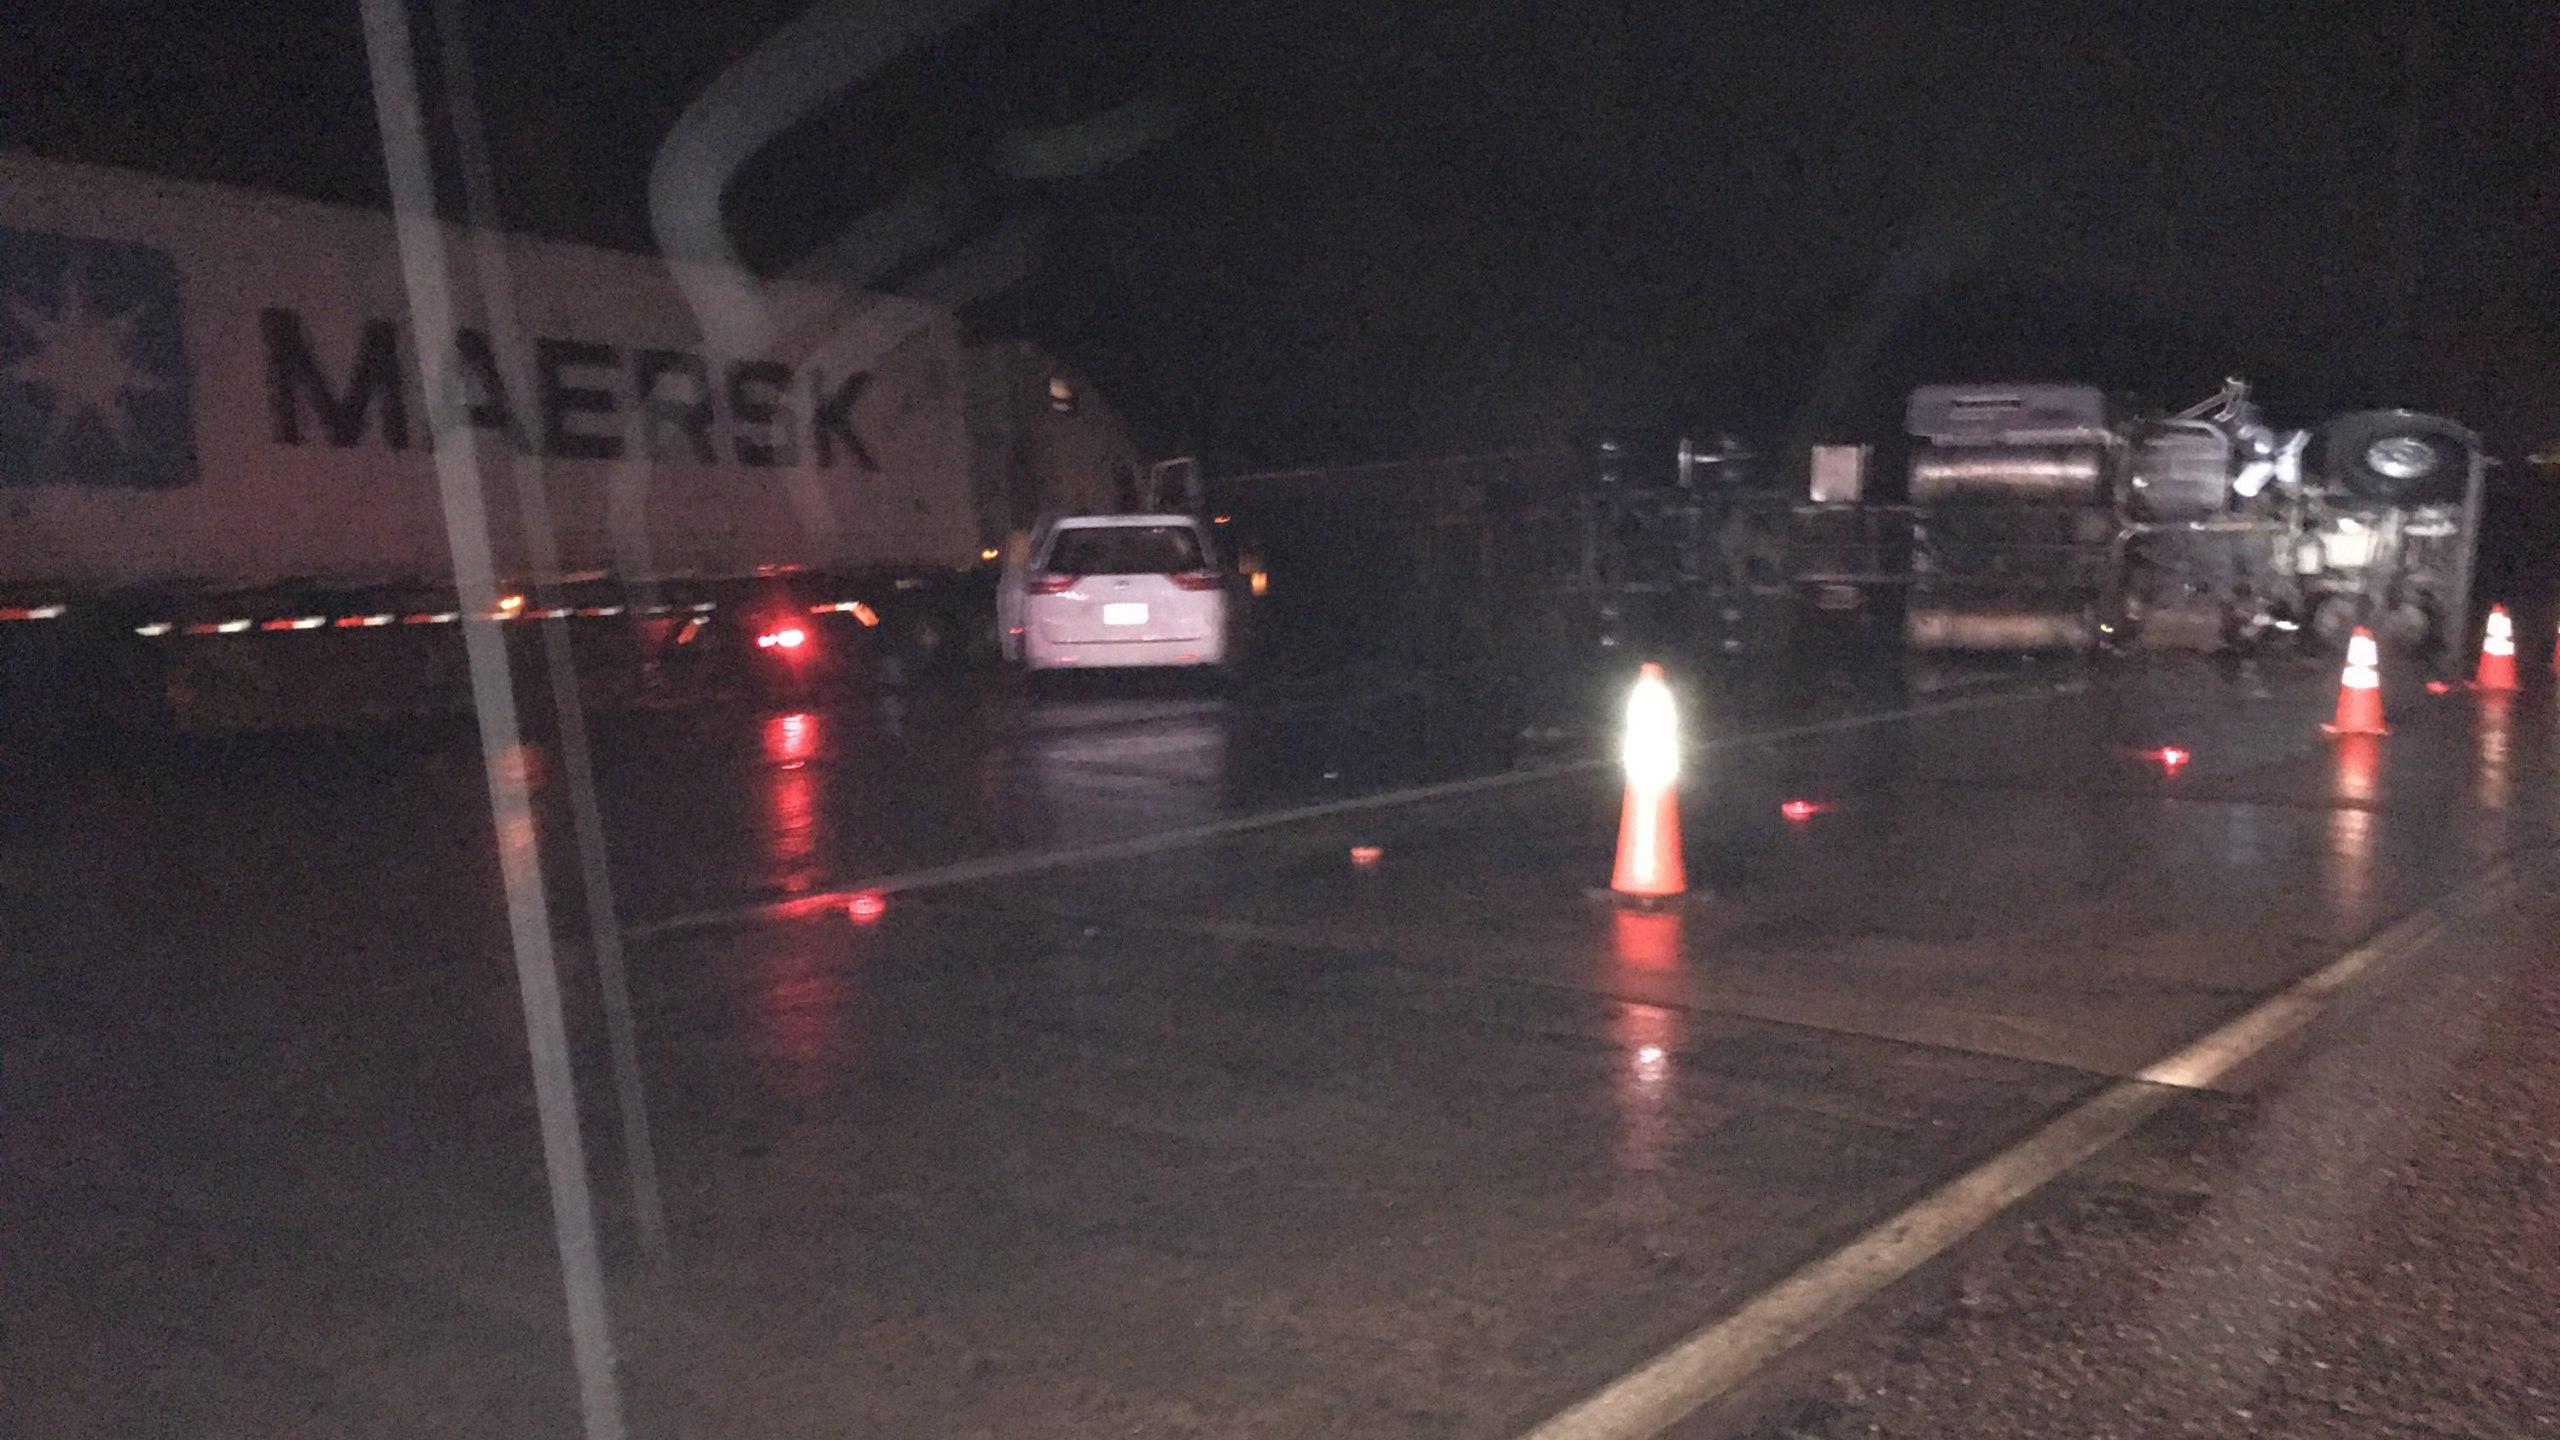 Accident on I-95 near Yemassee_382184